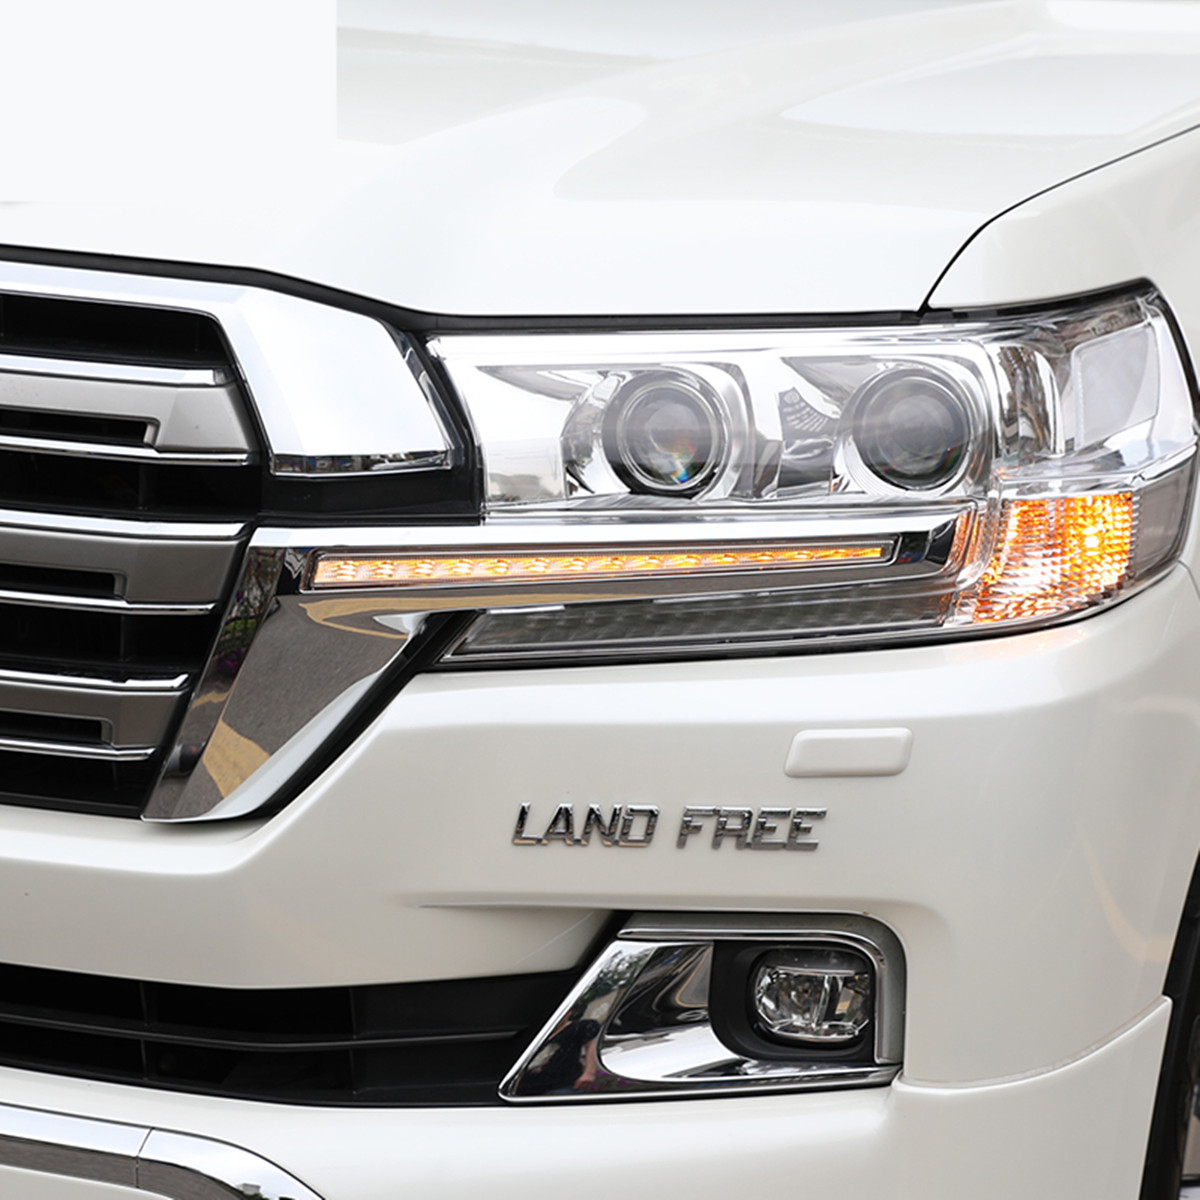 LED Headlight Strip for Toyota Land Cruiser 200 FJ200 2016 2017 2018 2019 Chrome ABS Daytime Running Light Accessories Mitsubishi Pajero